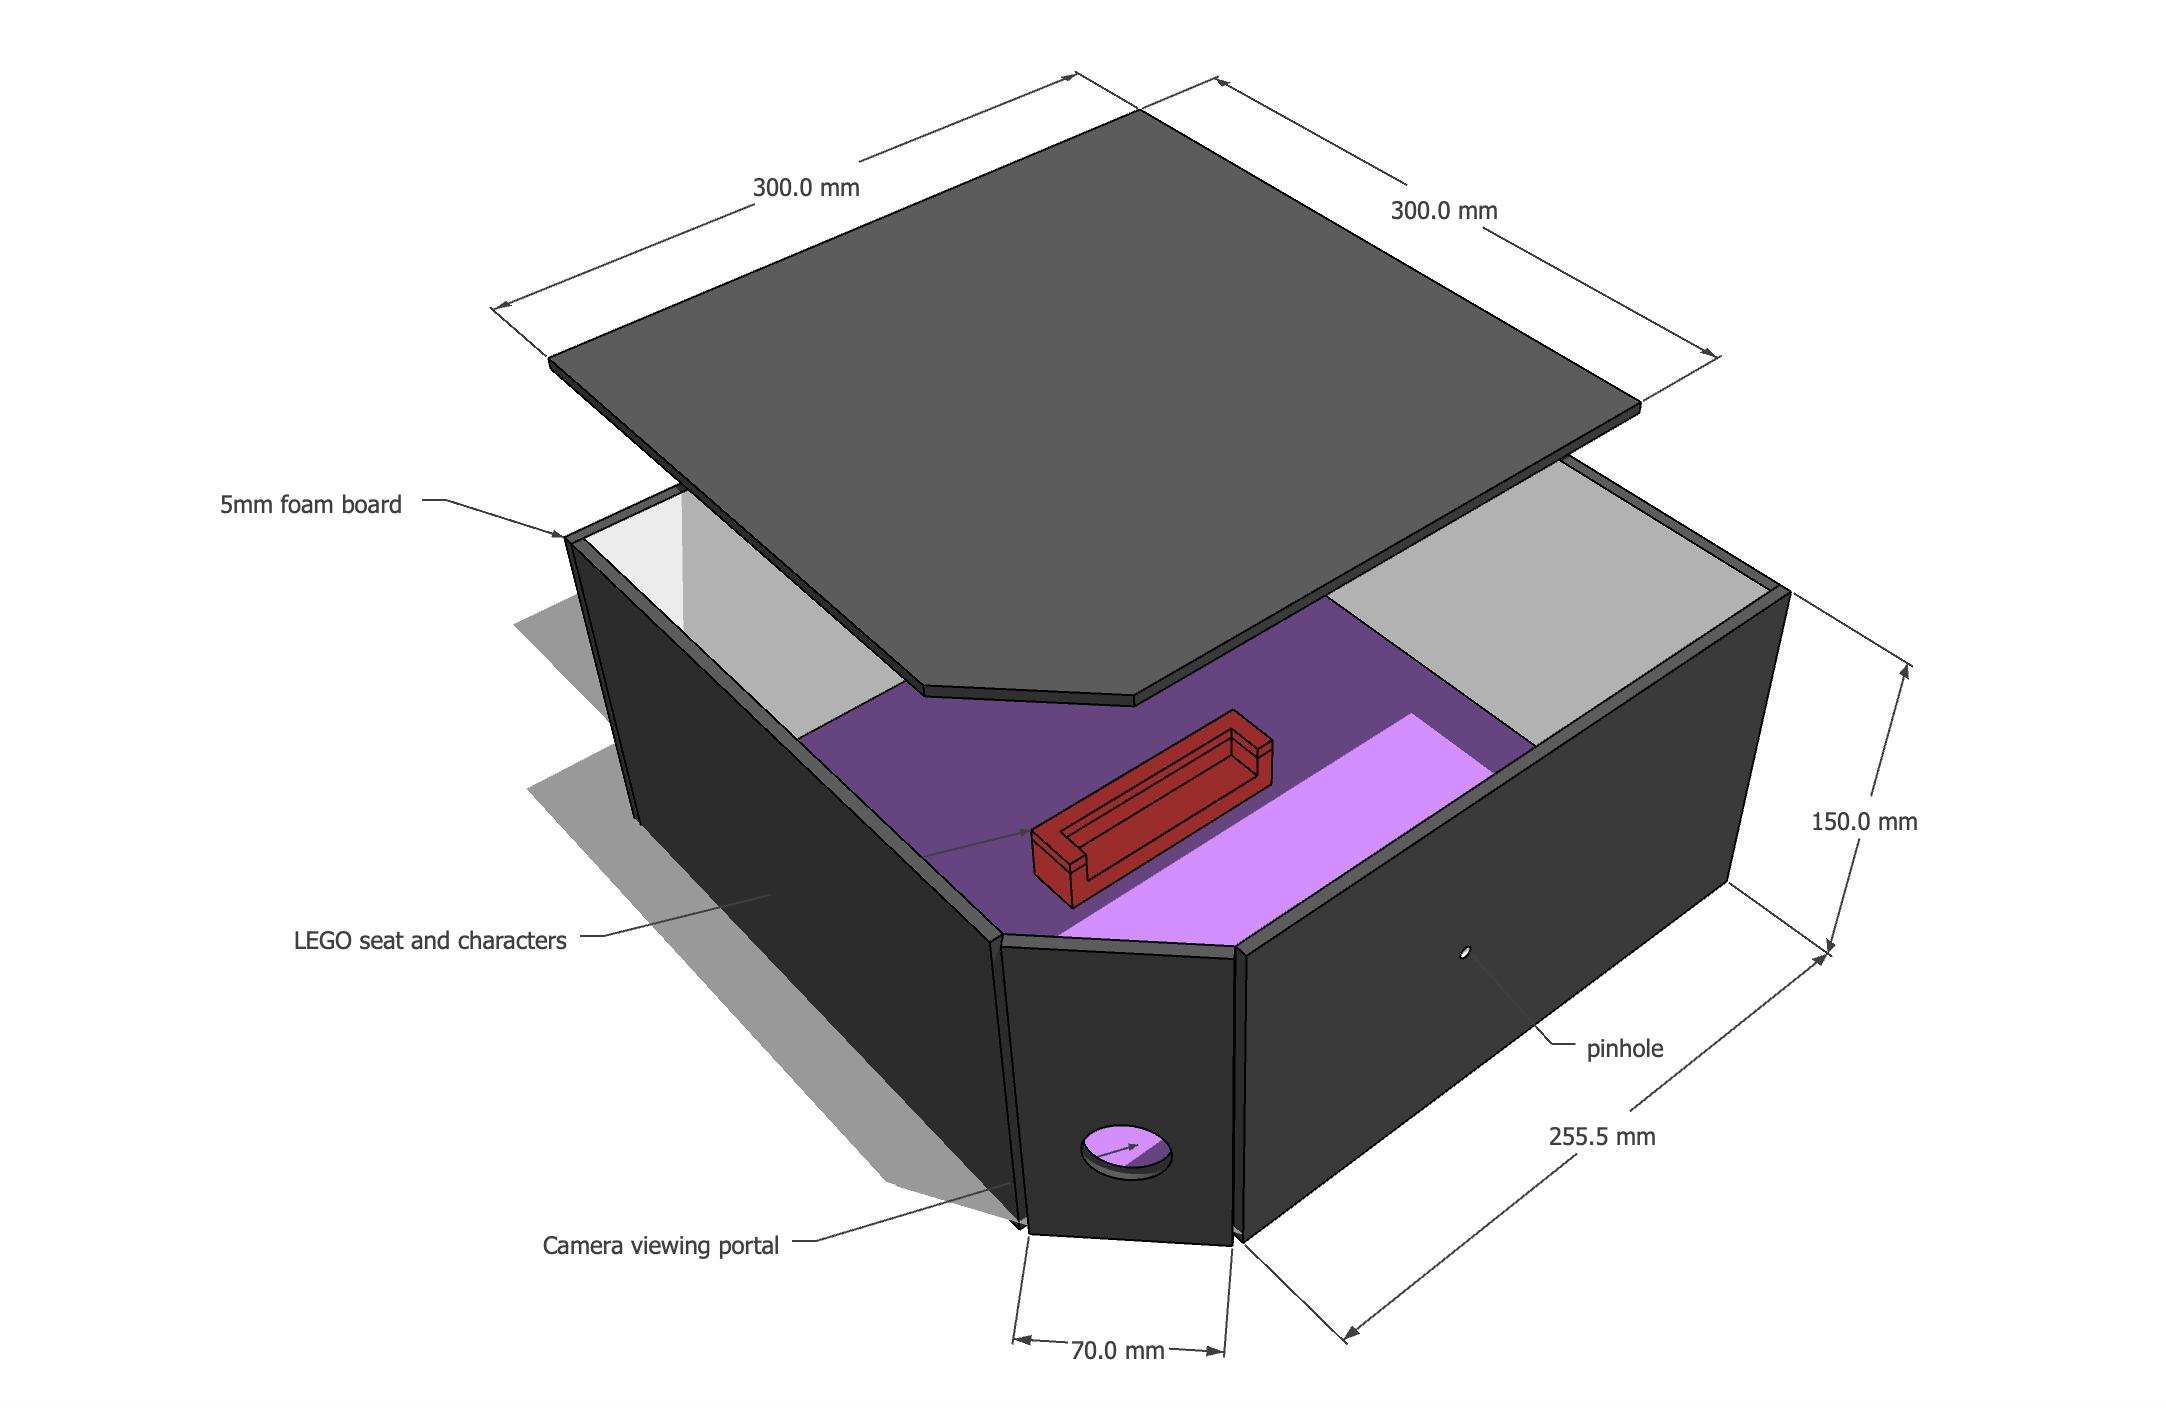 design for the lego lockdown camera